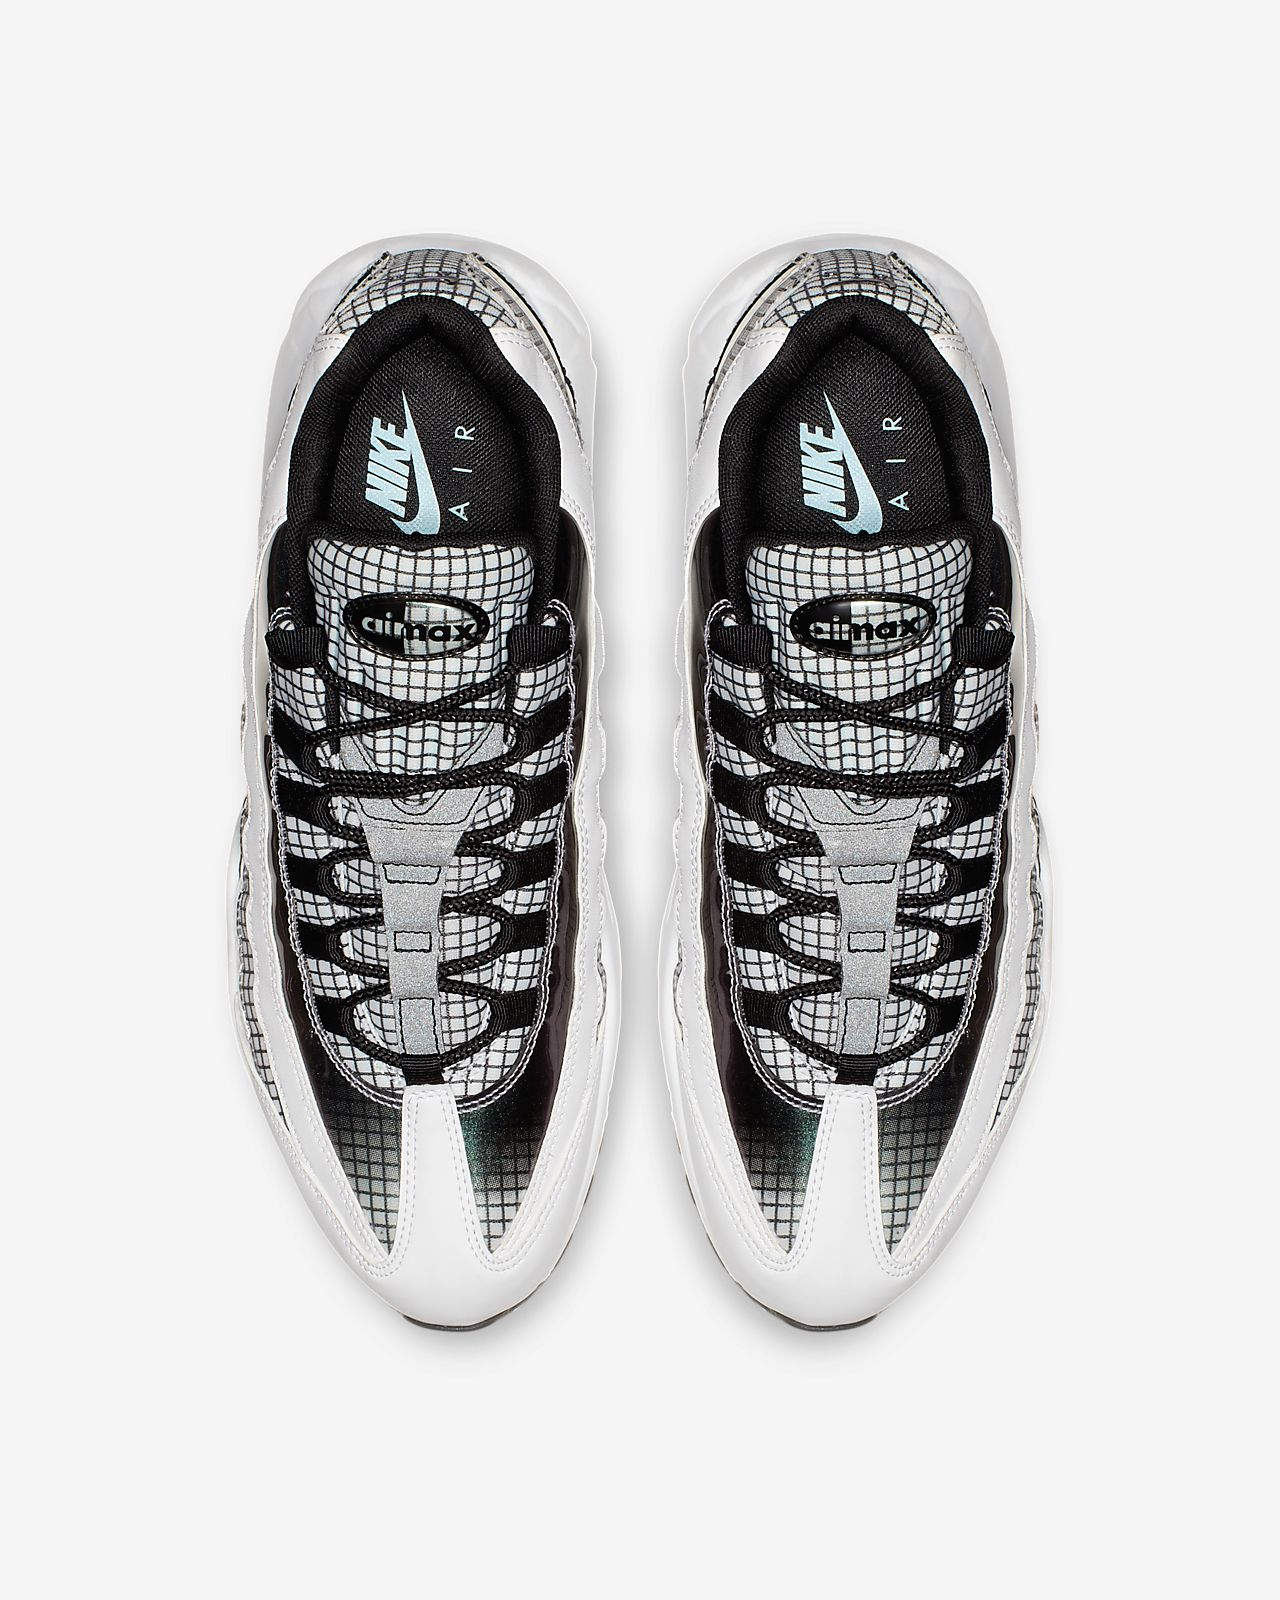 on sale 90555 3c9a6 ... Nike Air Max 95 LV8 Men s Shoe